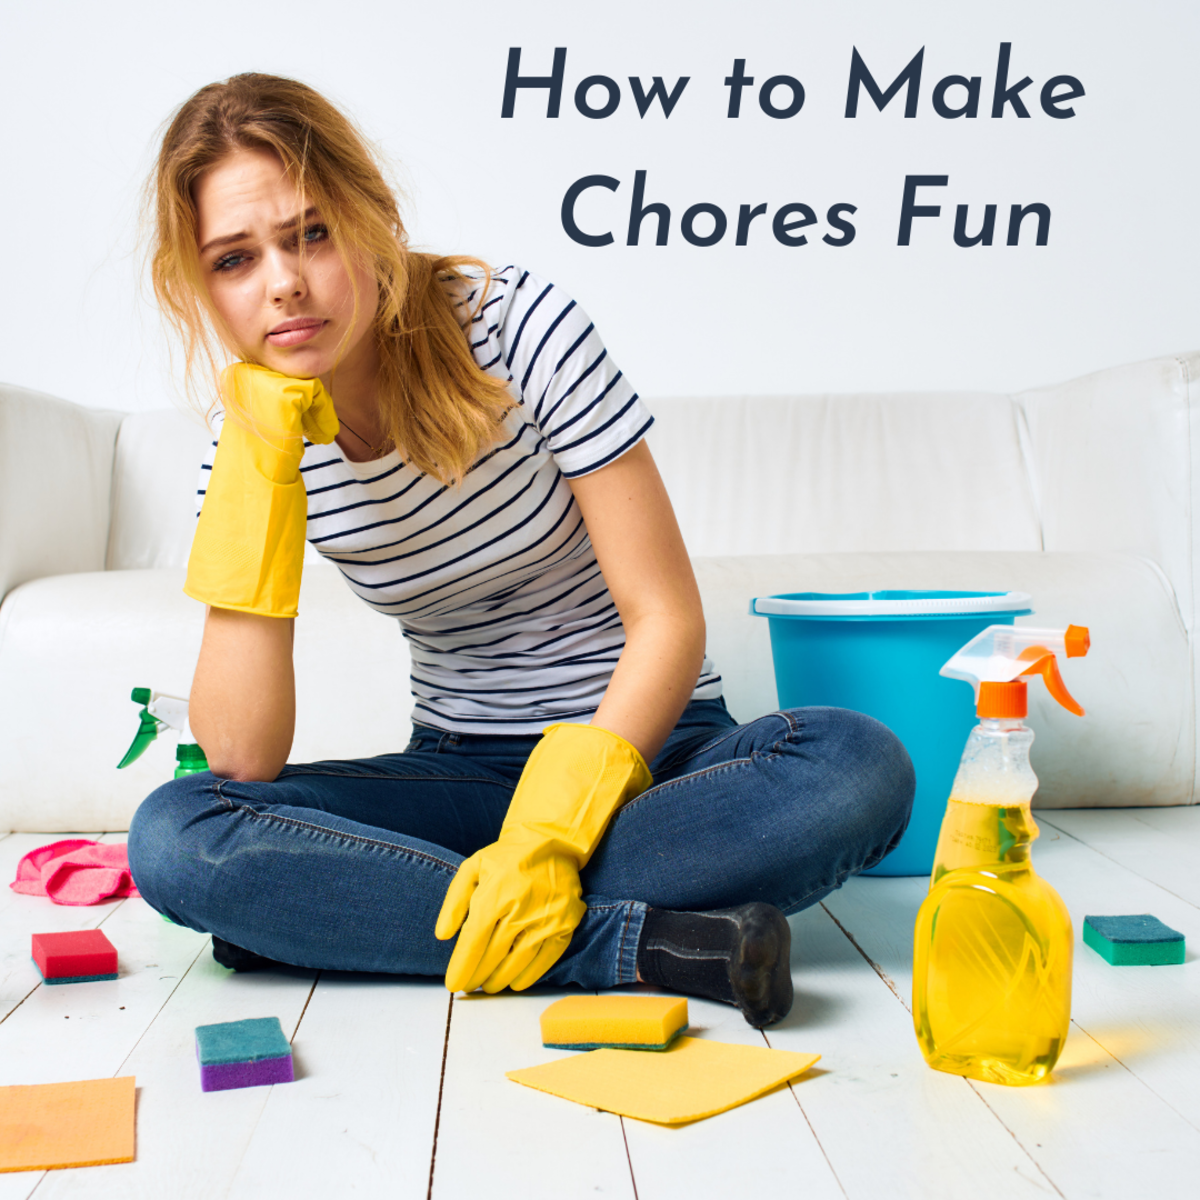 25 simple ways to make chores more fun